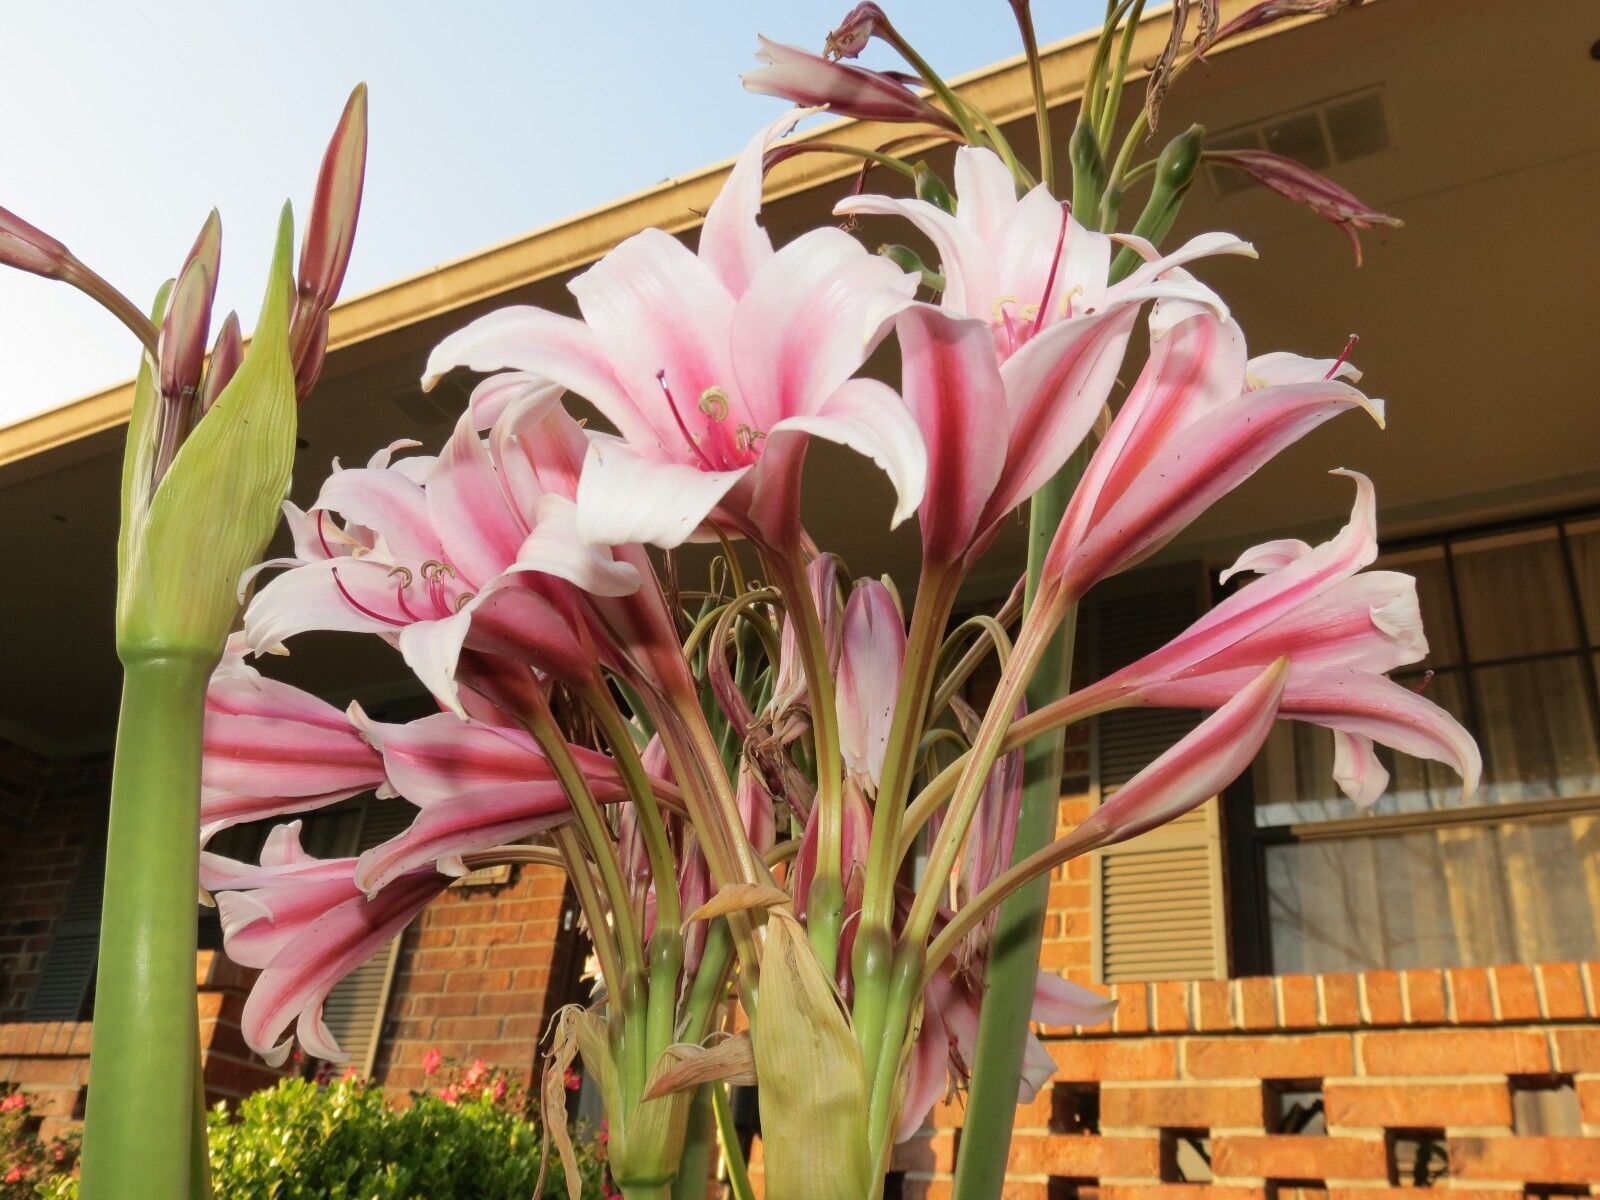 Lirio De Crinum, bulbispermum reina de ajedrez, Jumbo, floreciente-Bombilla de Tamaño